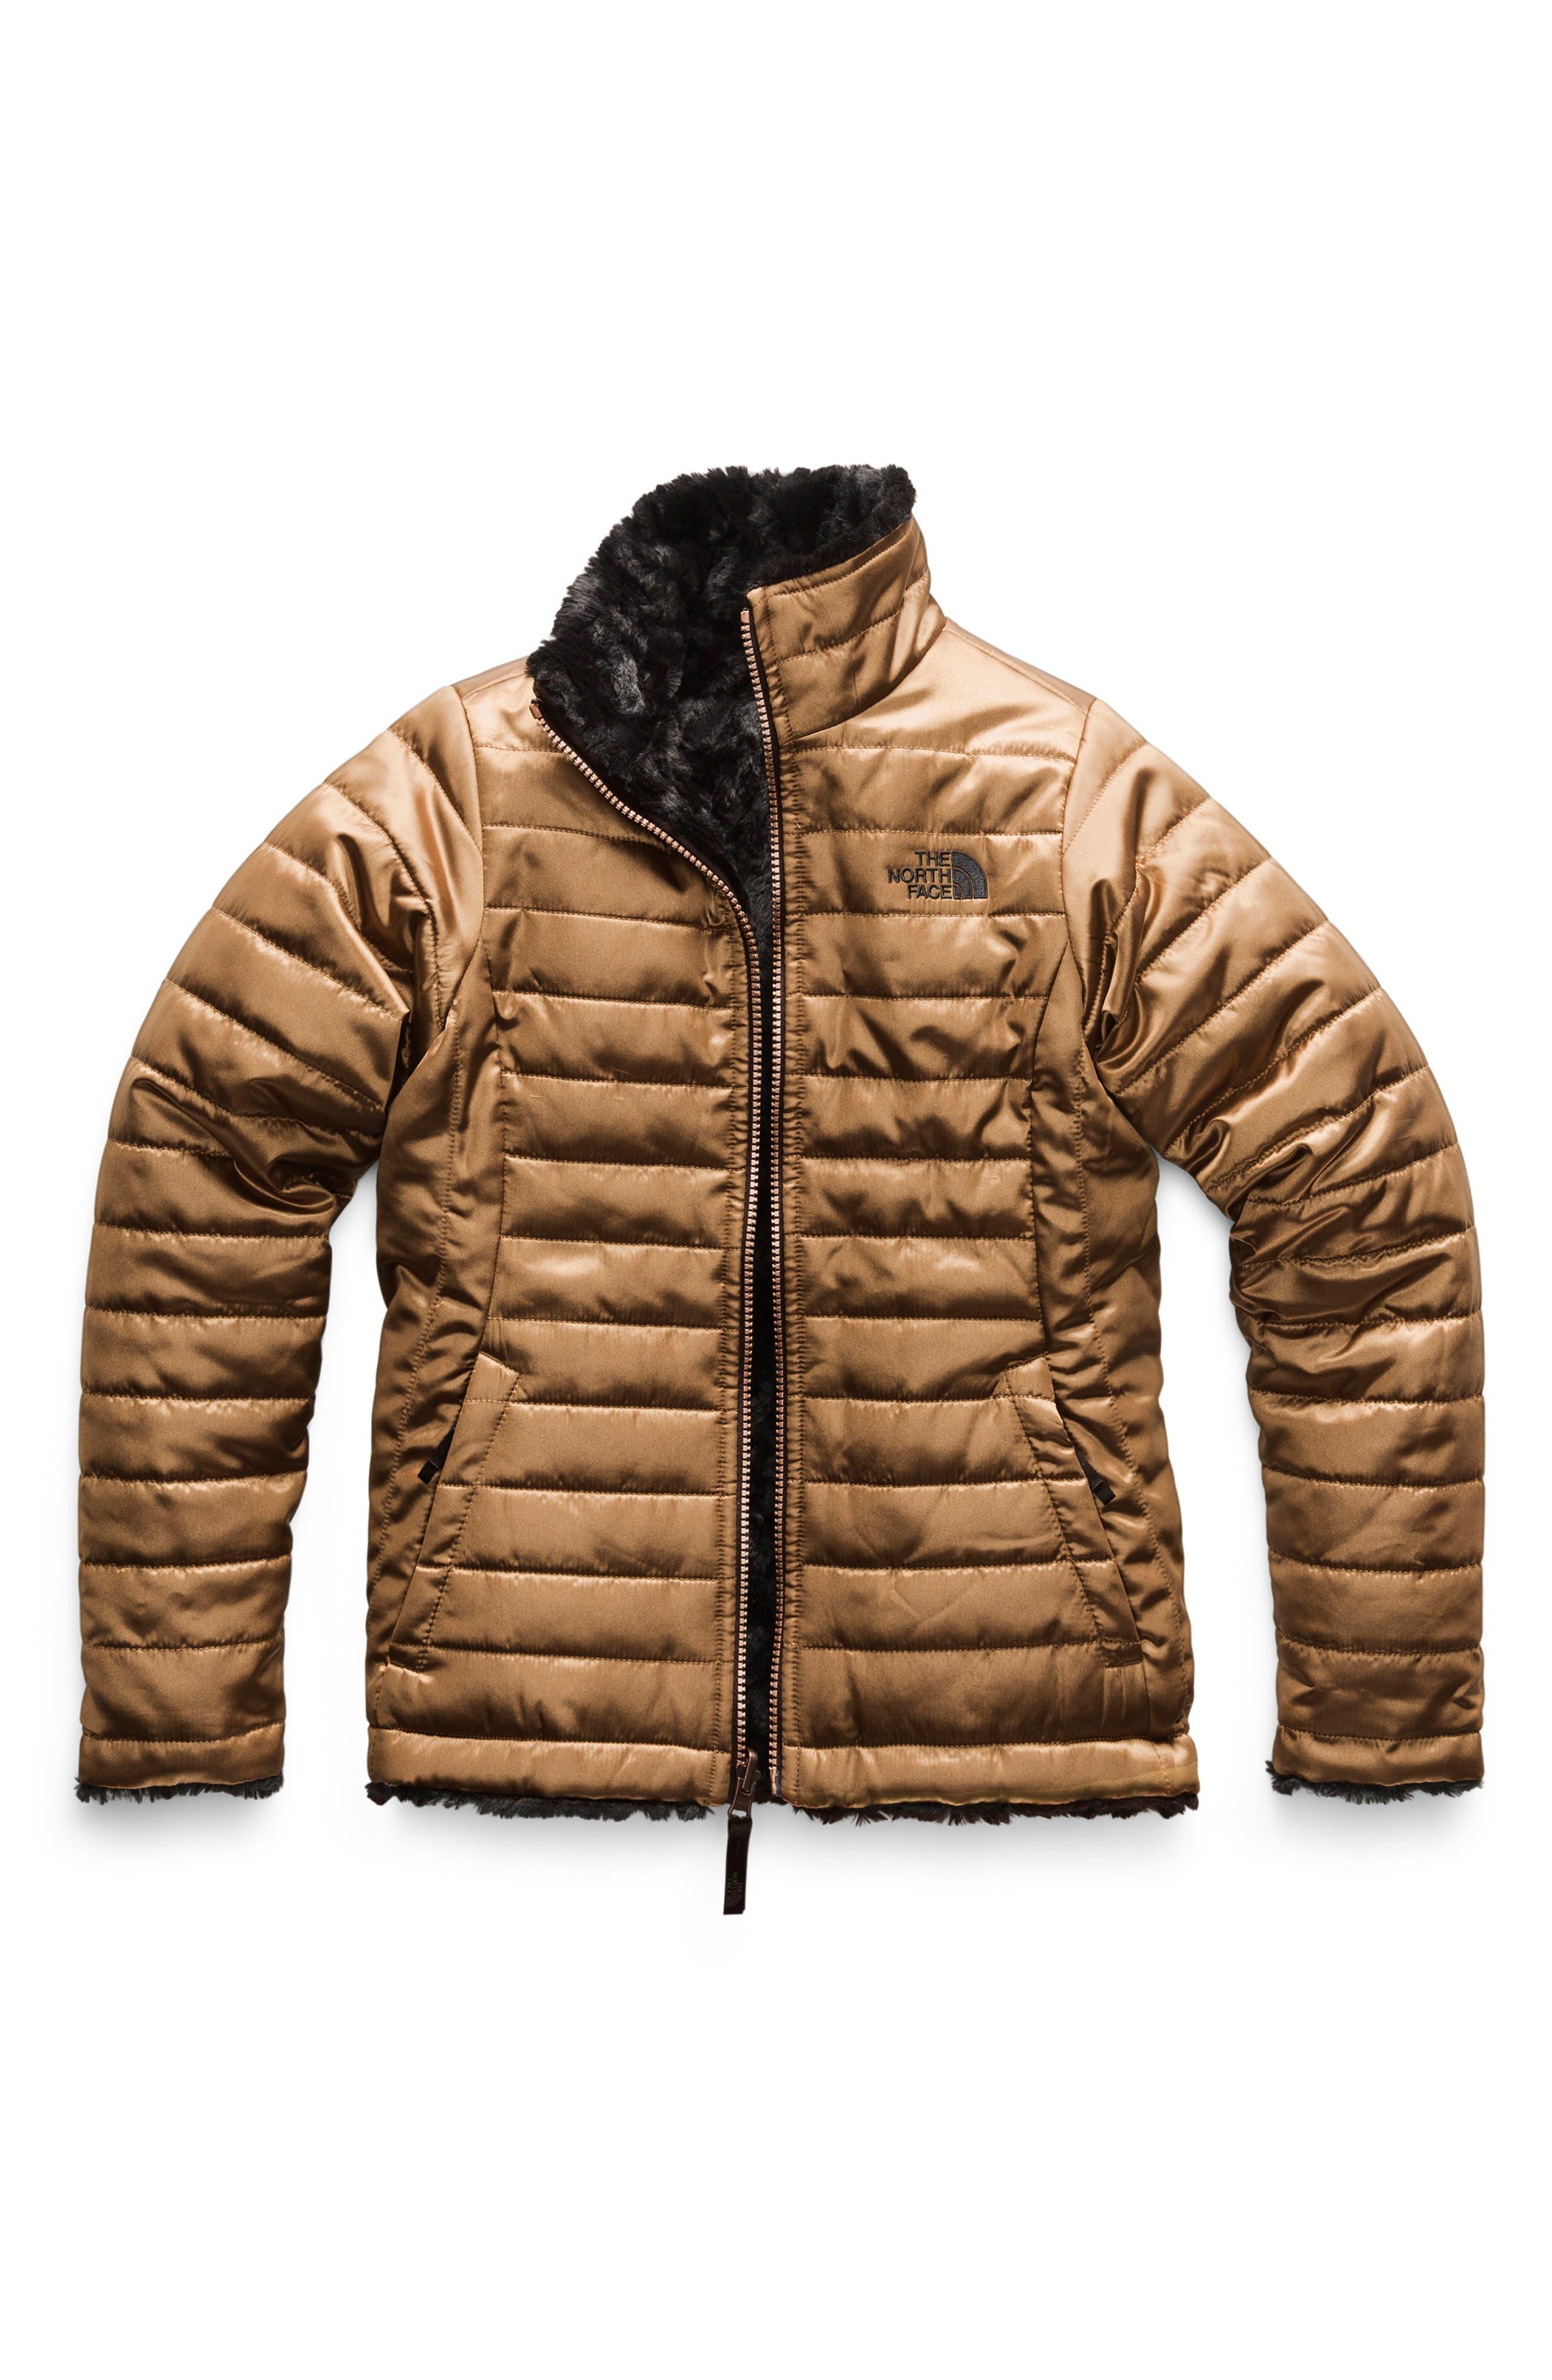 Mossbud Swirl Reversible Water Resistant Jacket,                             Main thumbnail 1, color,                             METALLIC COPPER